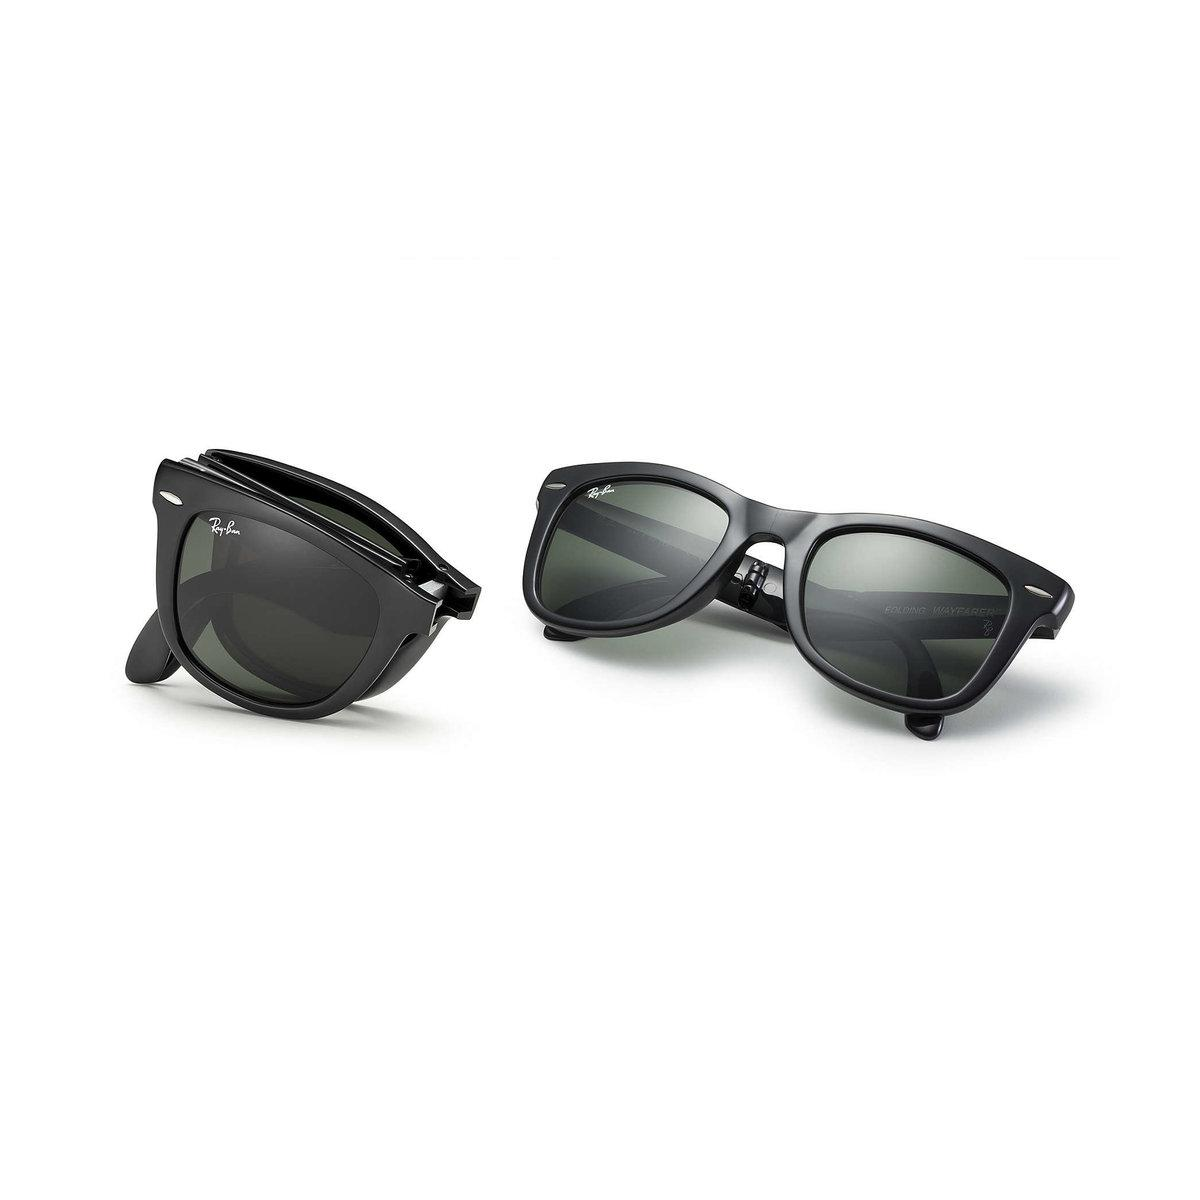 5ae313c2c6 Lyst - Ray-Ban Wayfarer Folding Classic Sunglasses – Green Classic G ...